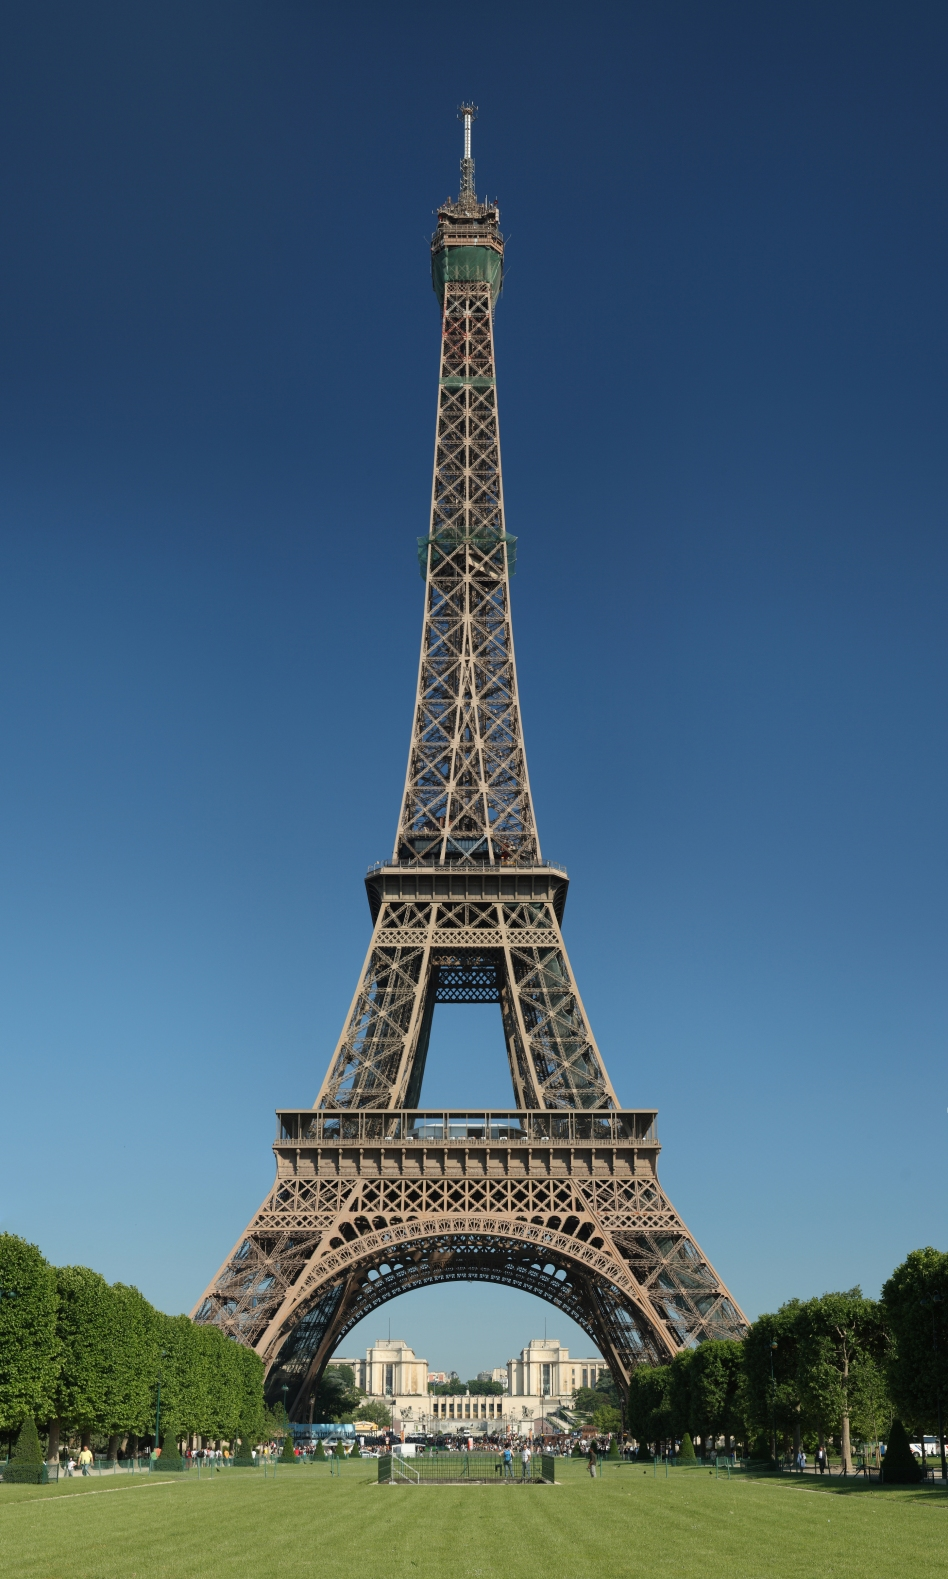 Tour_Eiffel_Wikimedia_Commons_(cropped).jpg